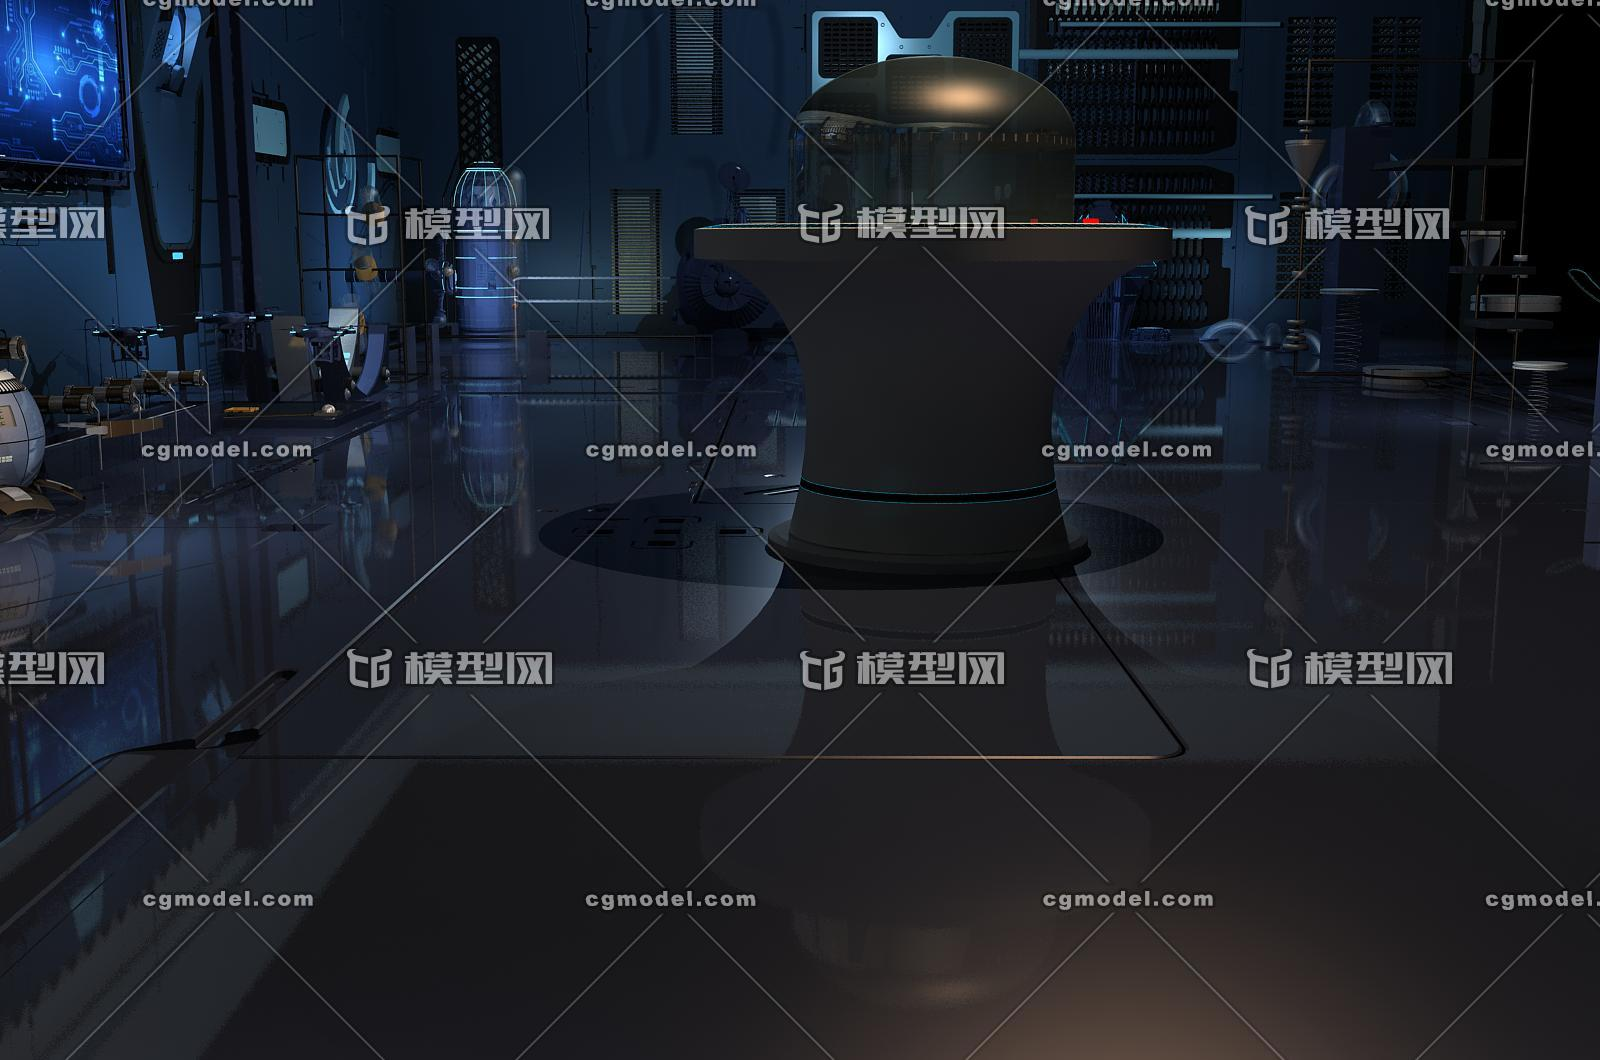 qq黑客群号_科幻室内 科技室内 创意工厂 未来工厂 孵化器 机械动画 小球 ...